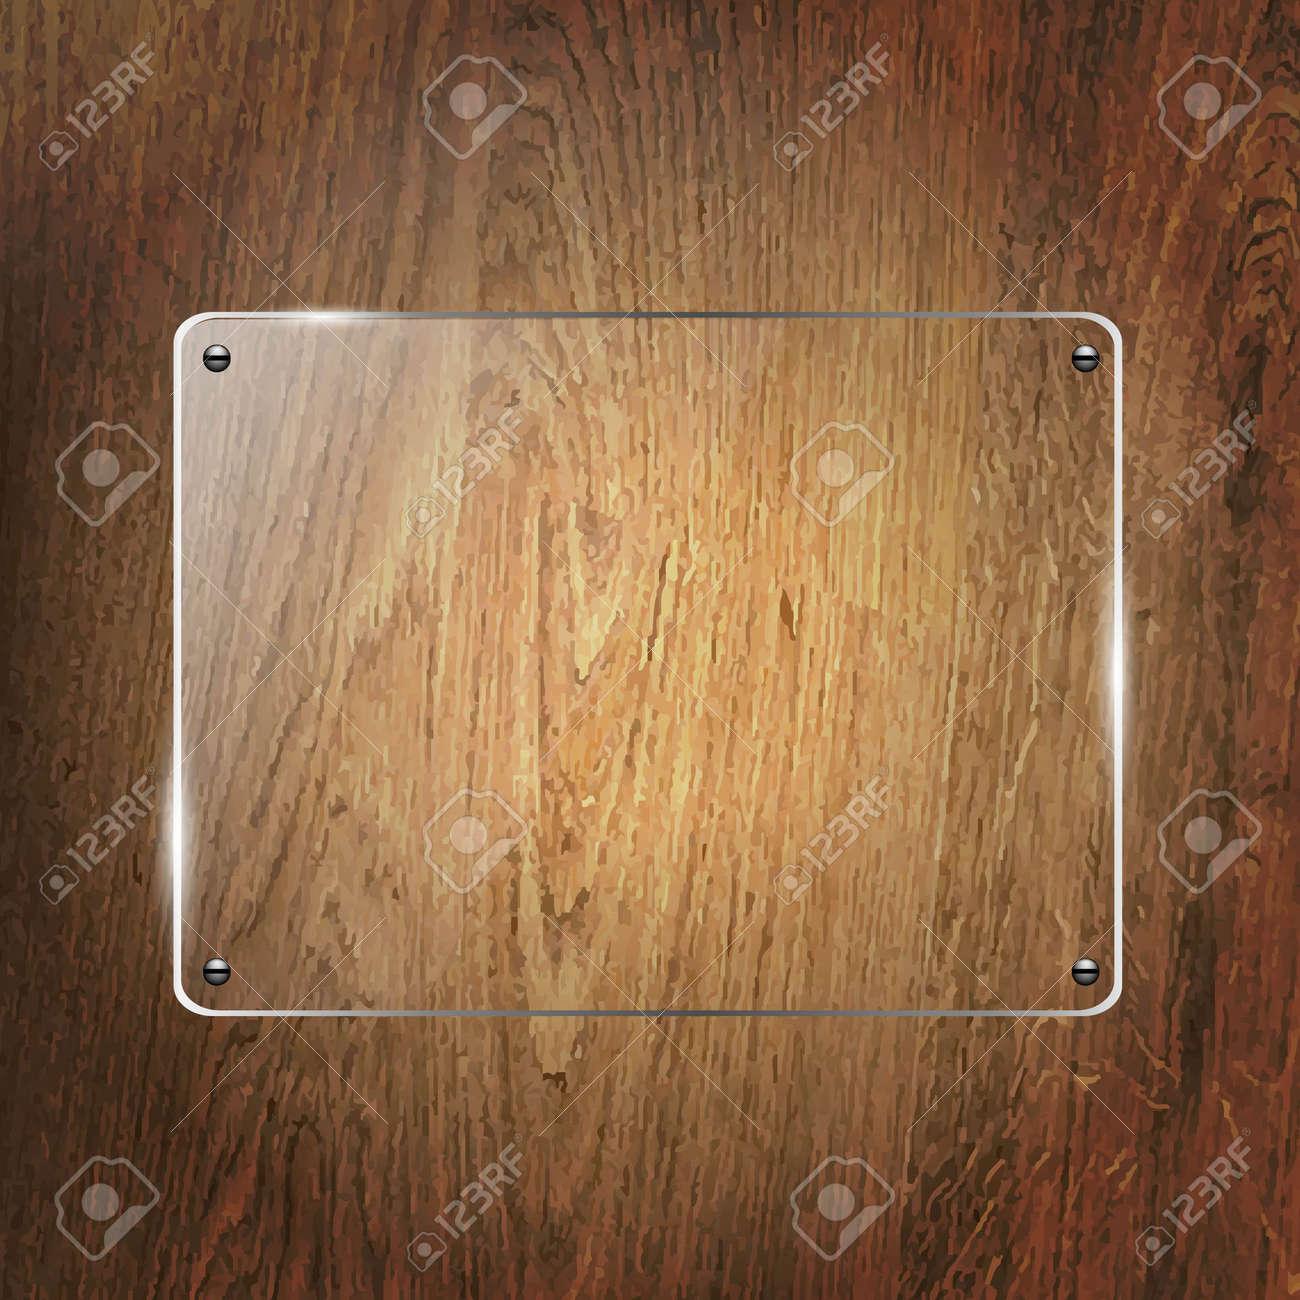 Glass Shelf On Wood Background, Vector Illustration - 21902882